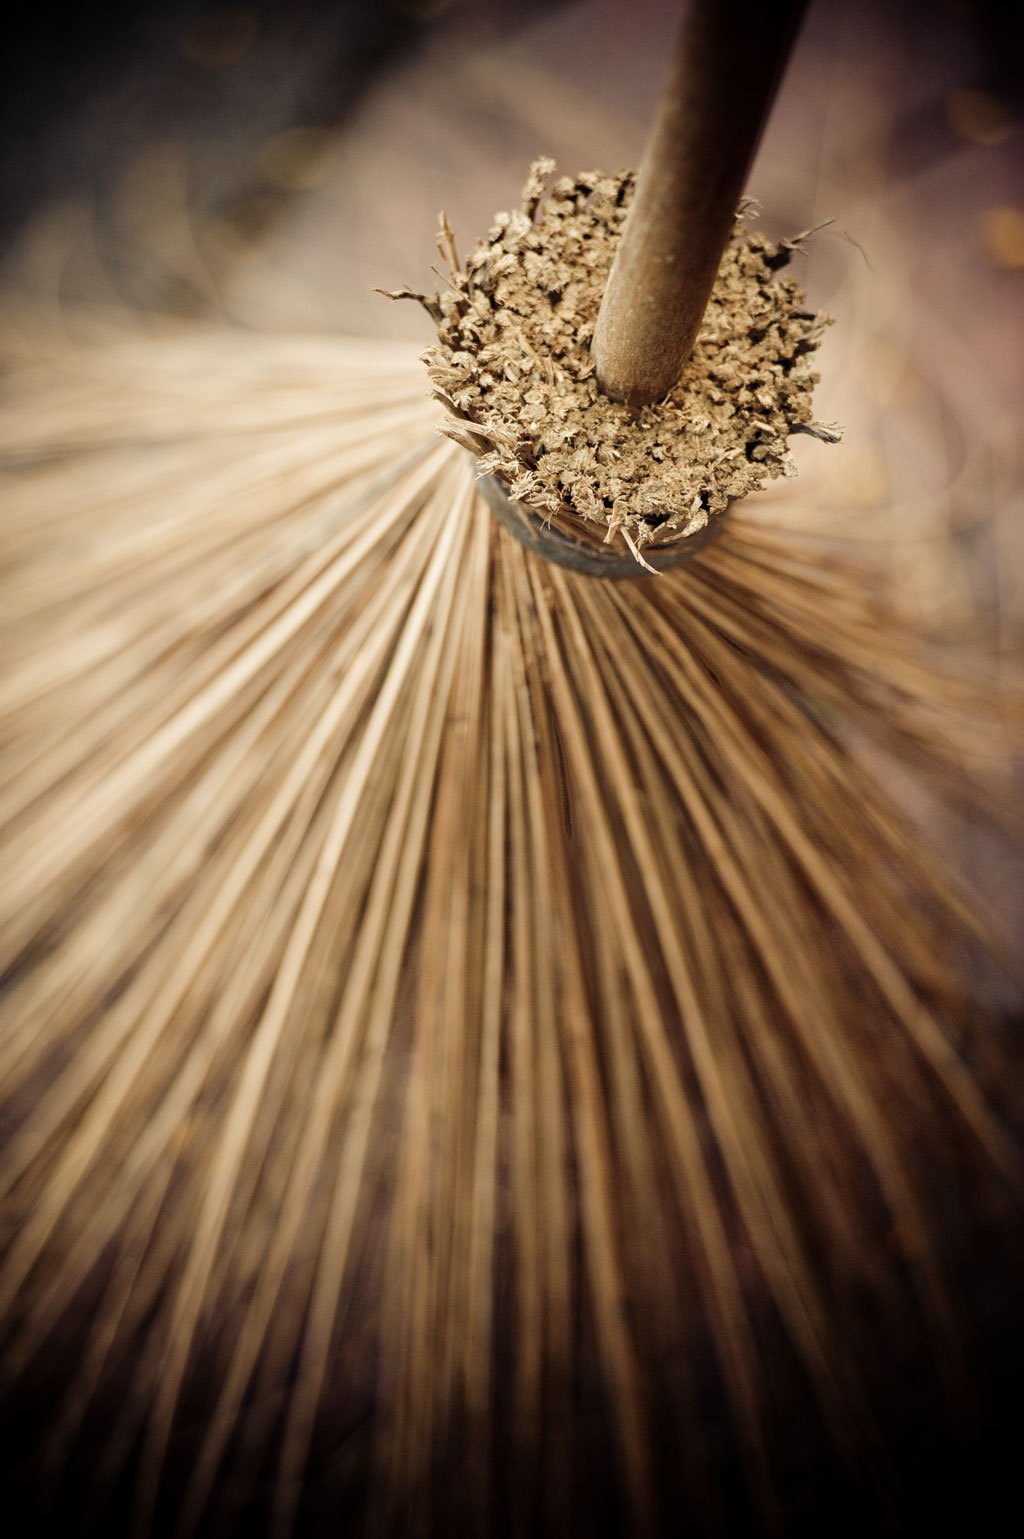 Thai Broom III, Fine Art Photograph By: Erin Berzel; One 24x36in Fine Art Paper Giclee Print by Gango Home Décor